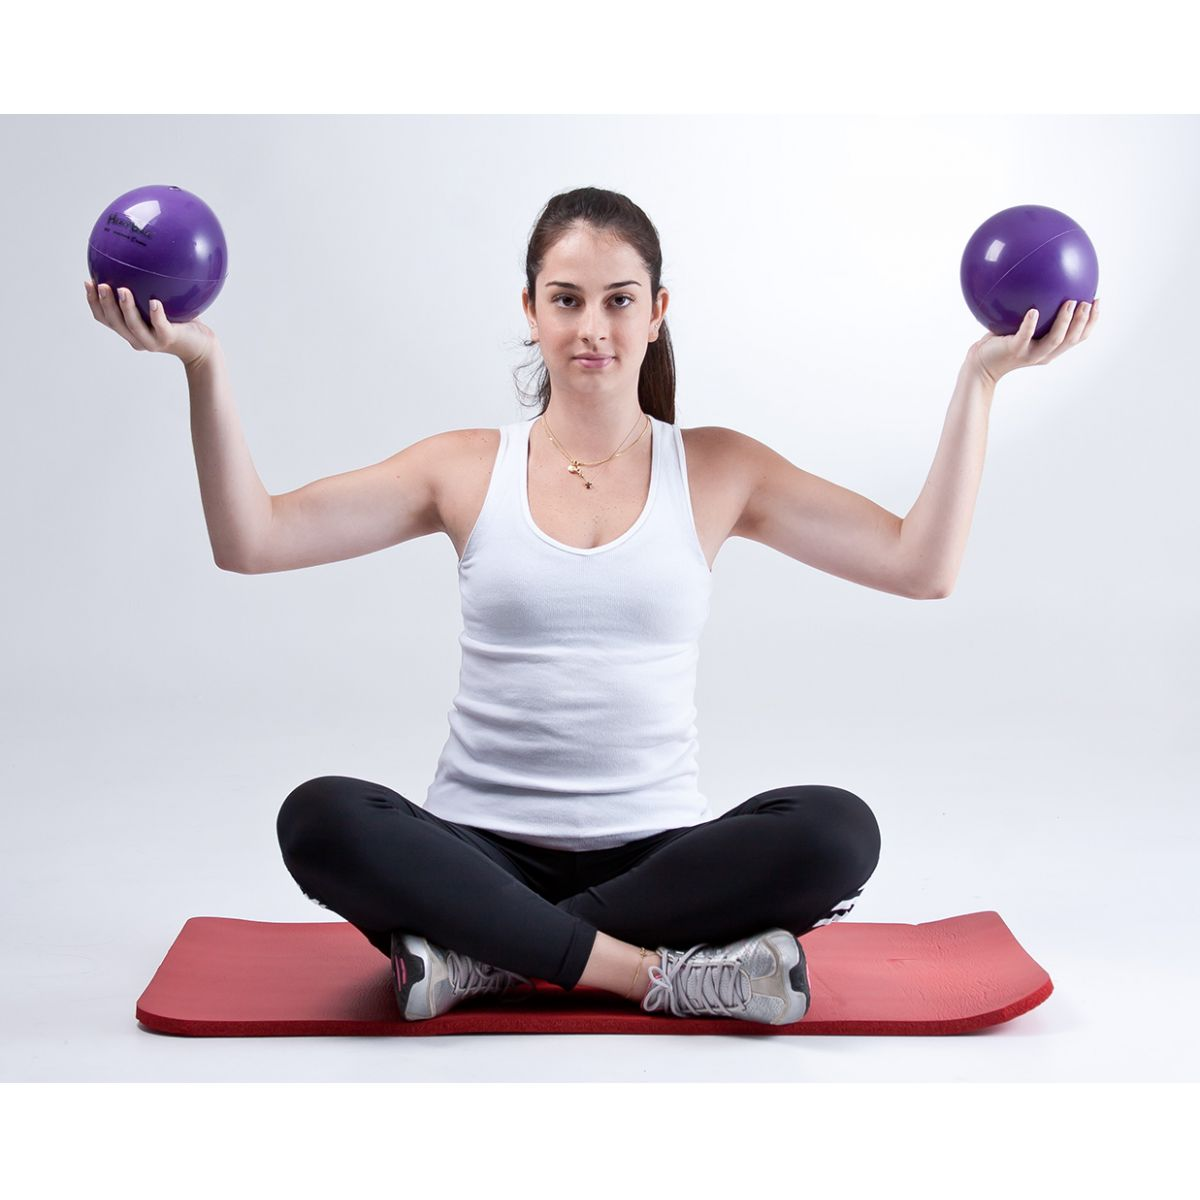 Bola para exercícios 2 kg Heavy Ball - BP.02